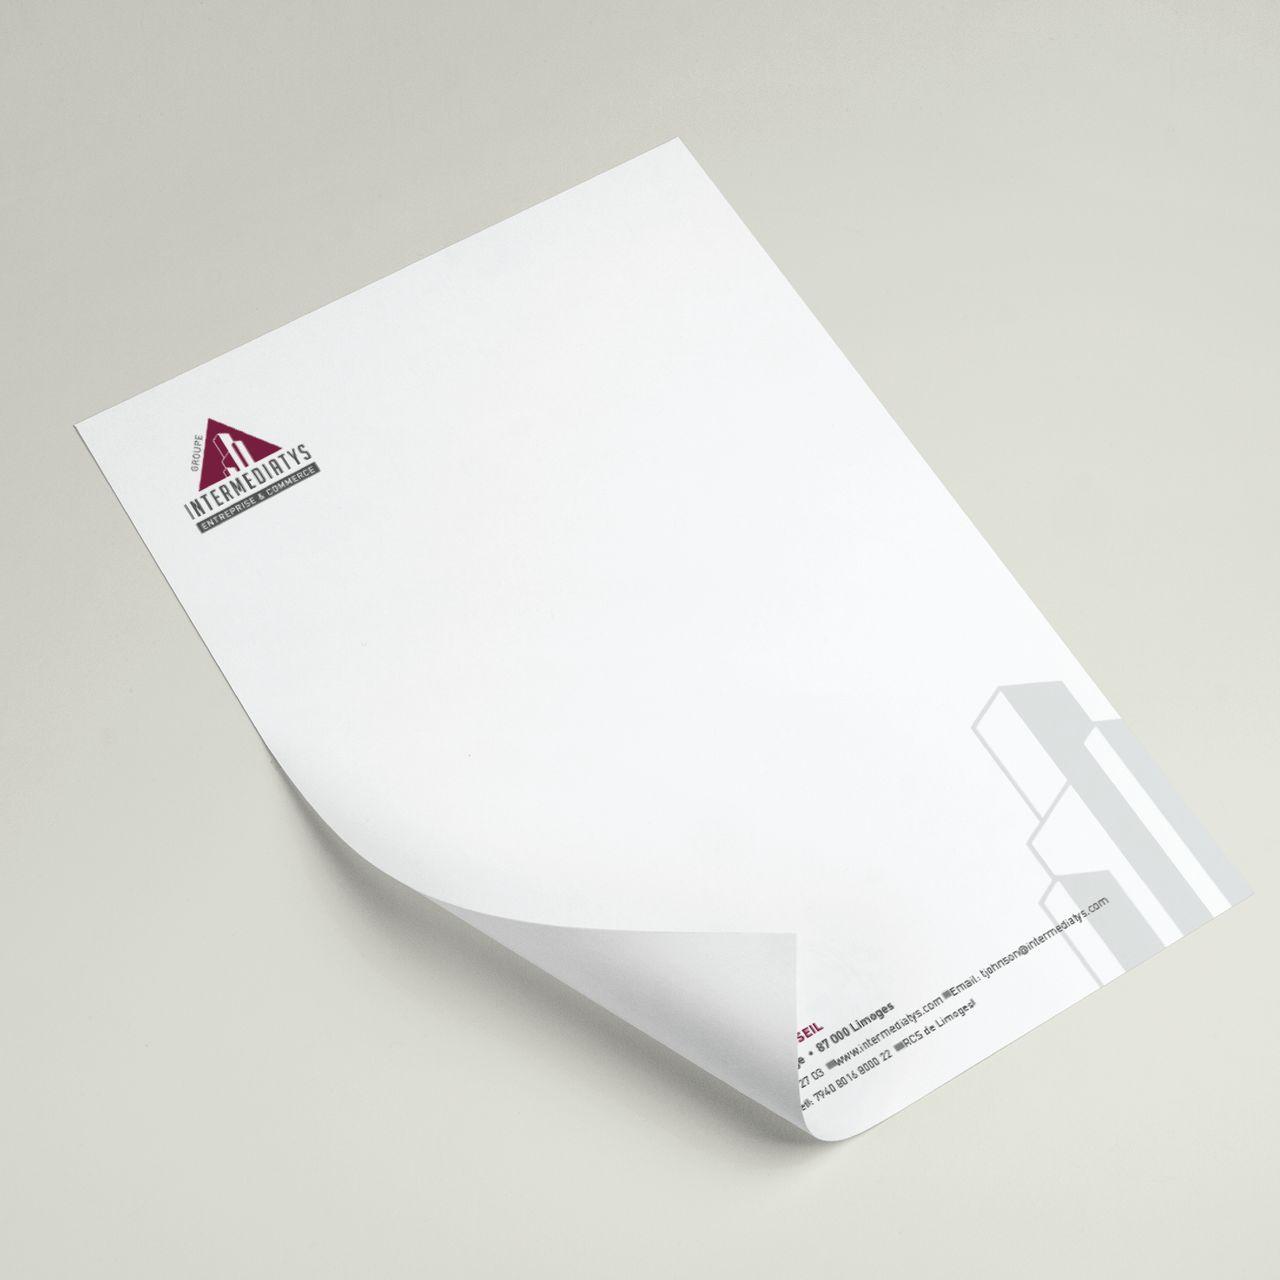 Tête de lettre Intermediatys Conseil